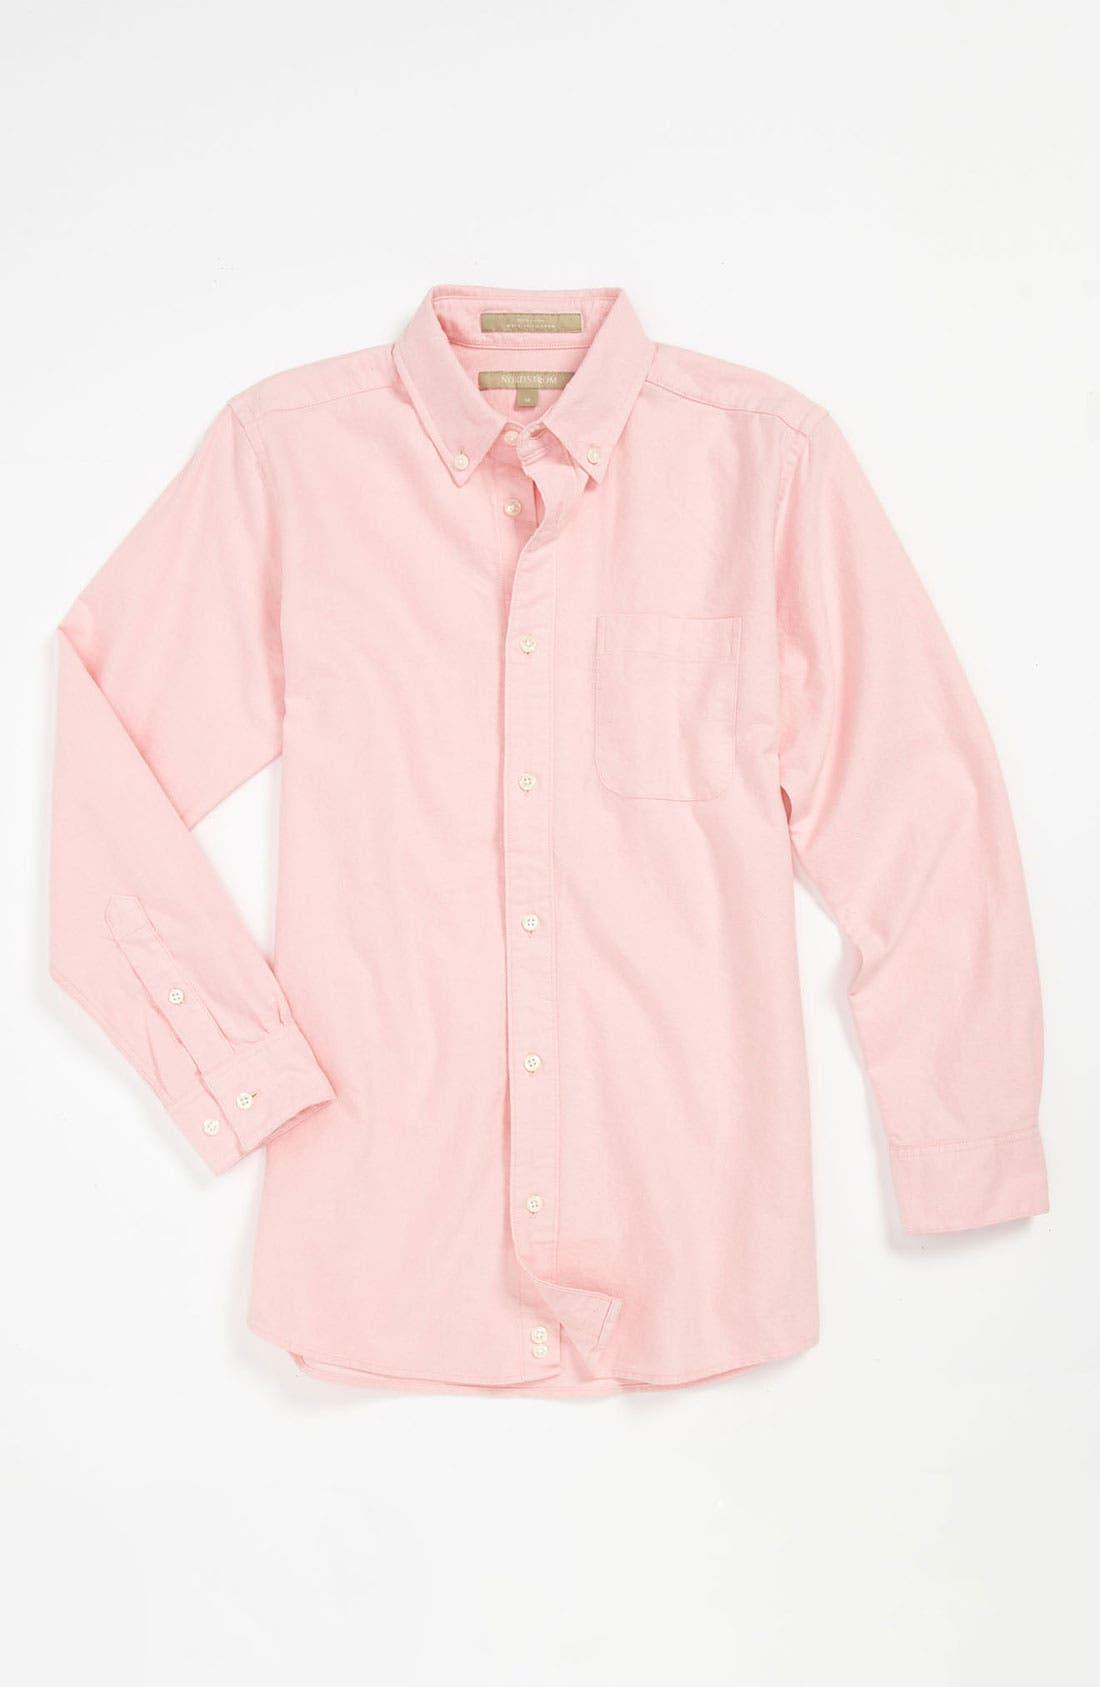 Main Image - Nordstrom 'Michael' Woven Oxford Shirt (Little Boys)